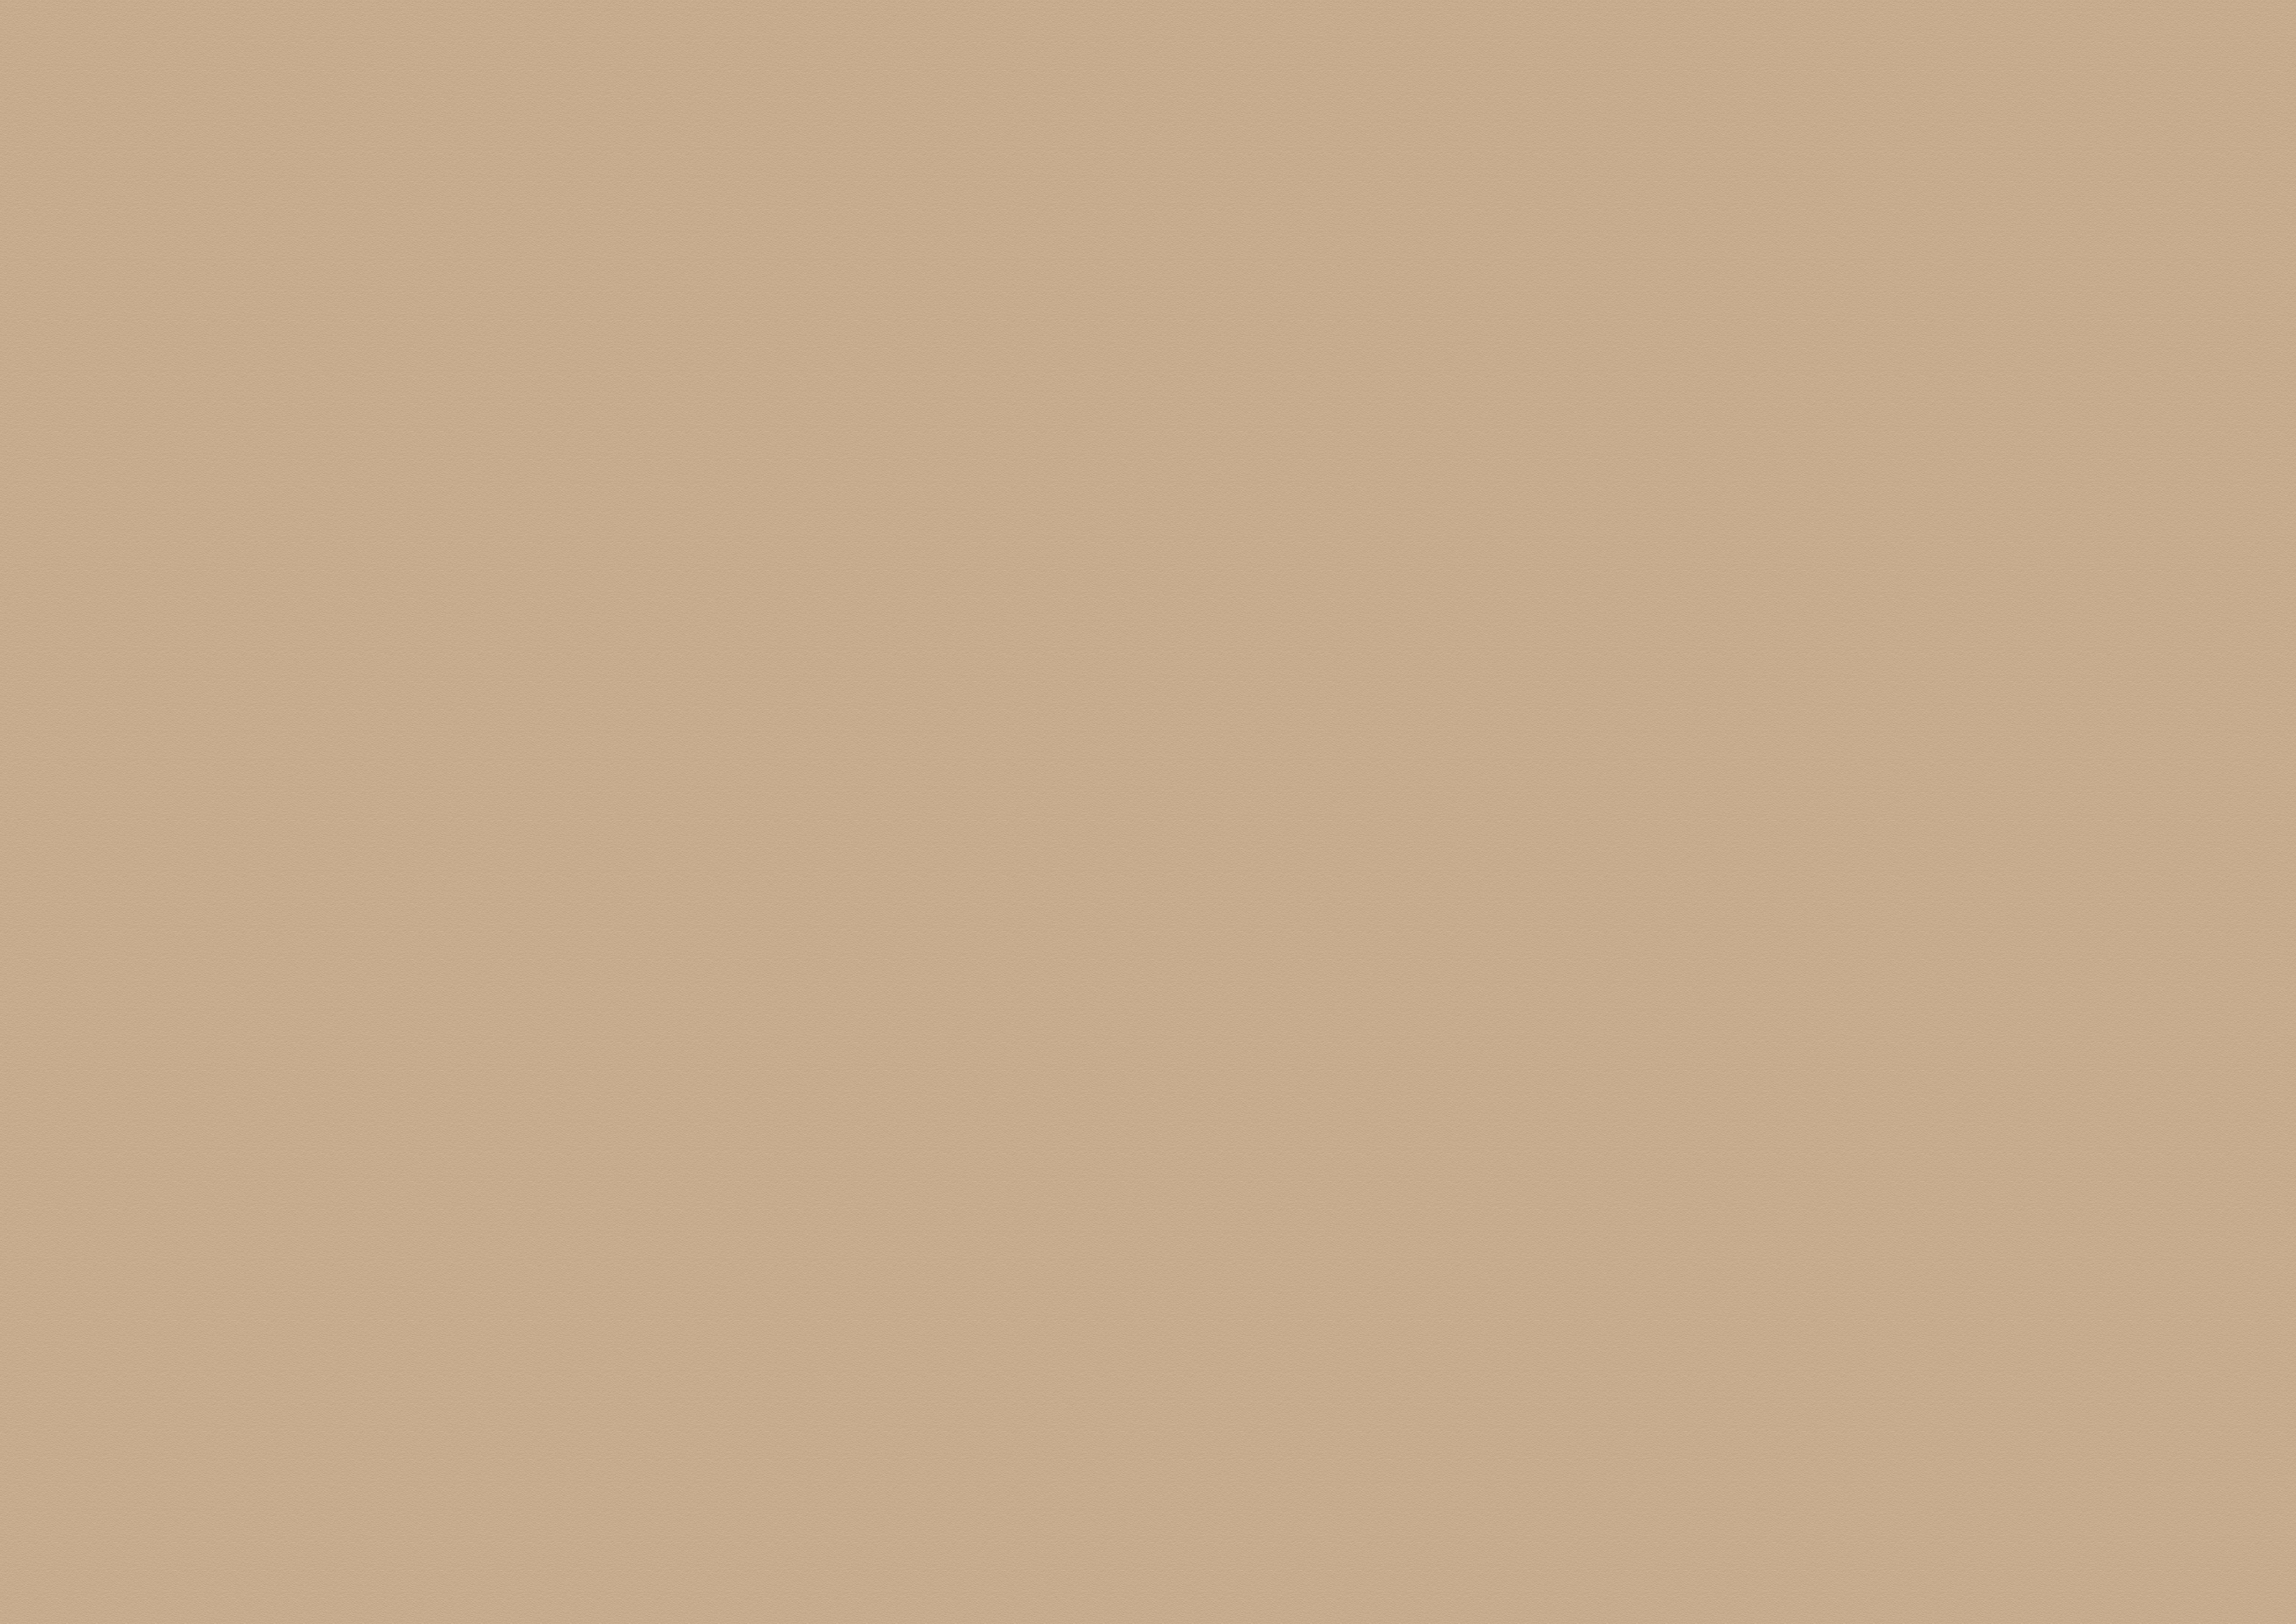 Camel/ Camel maro U204 ST9